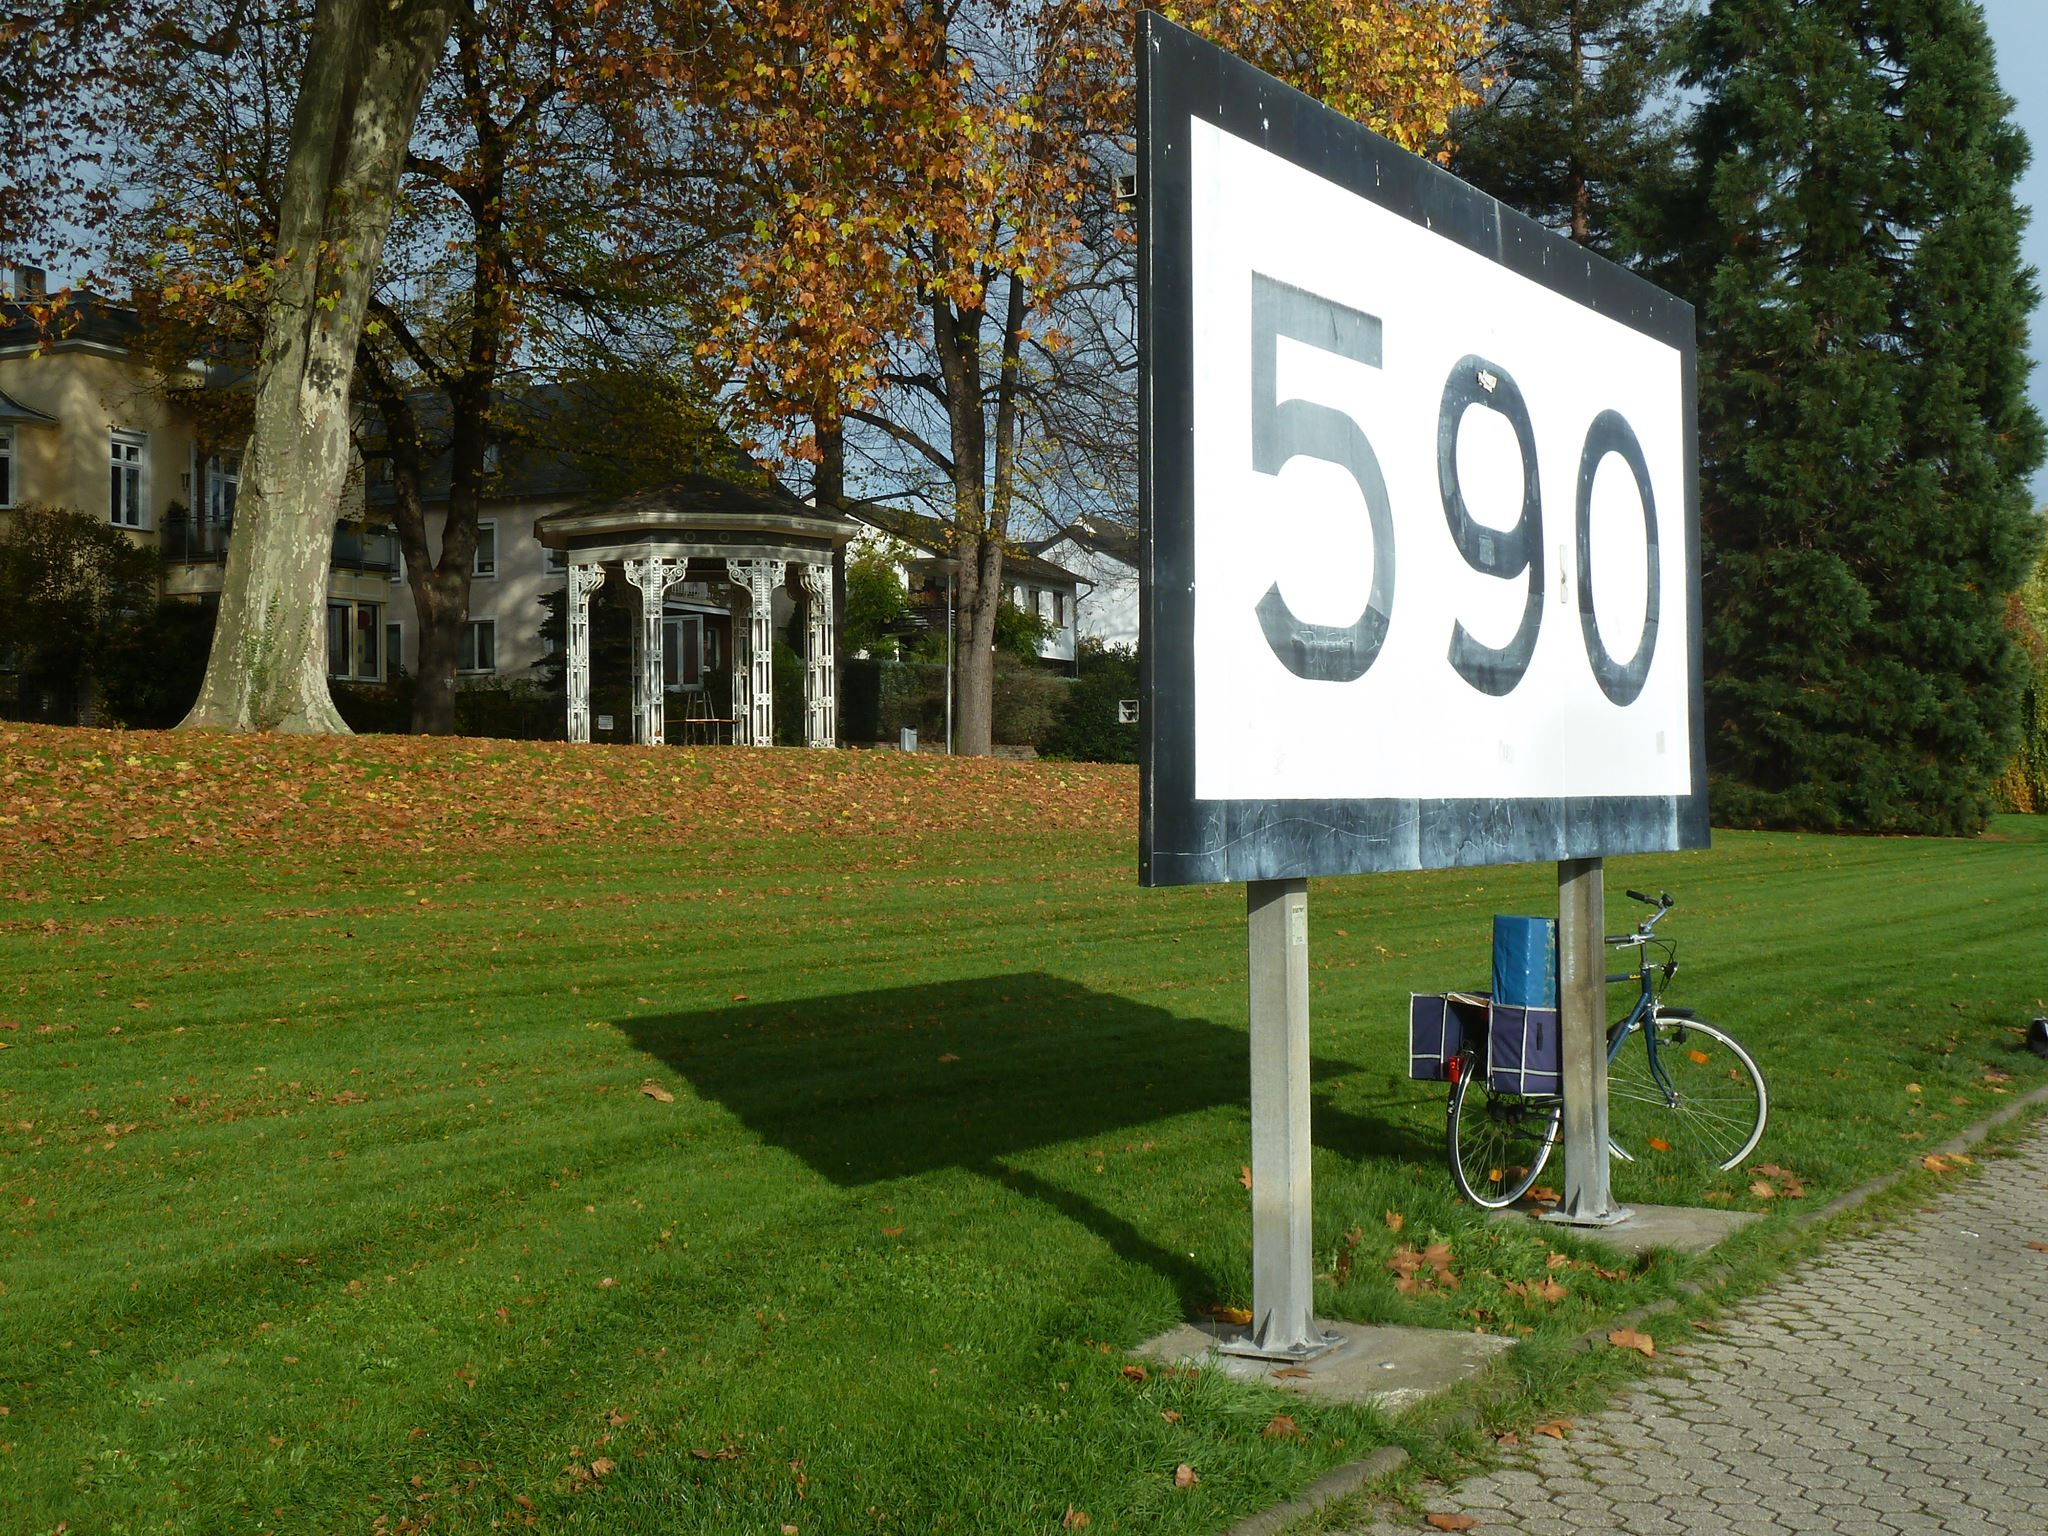 rheinkilometer-590-2